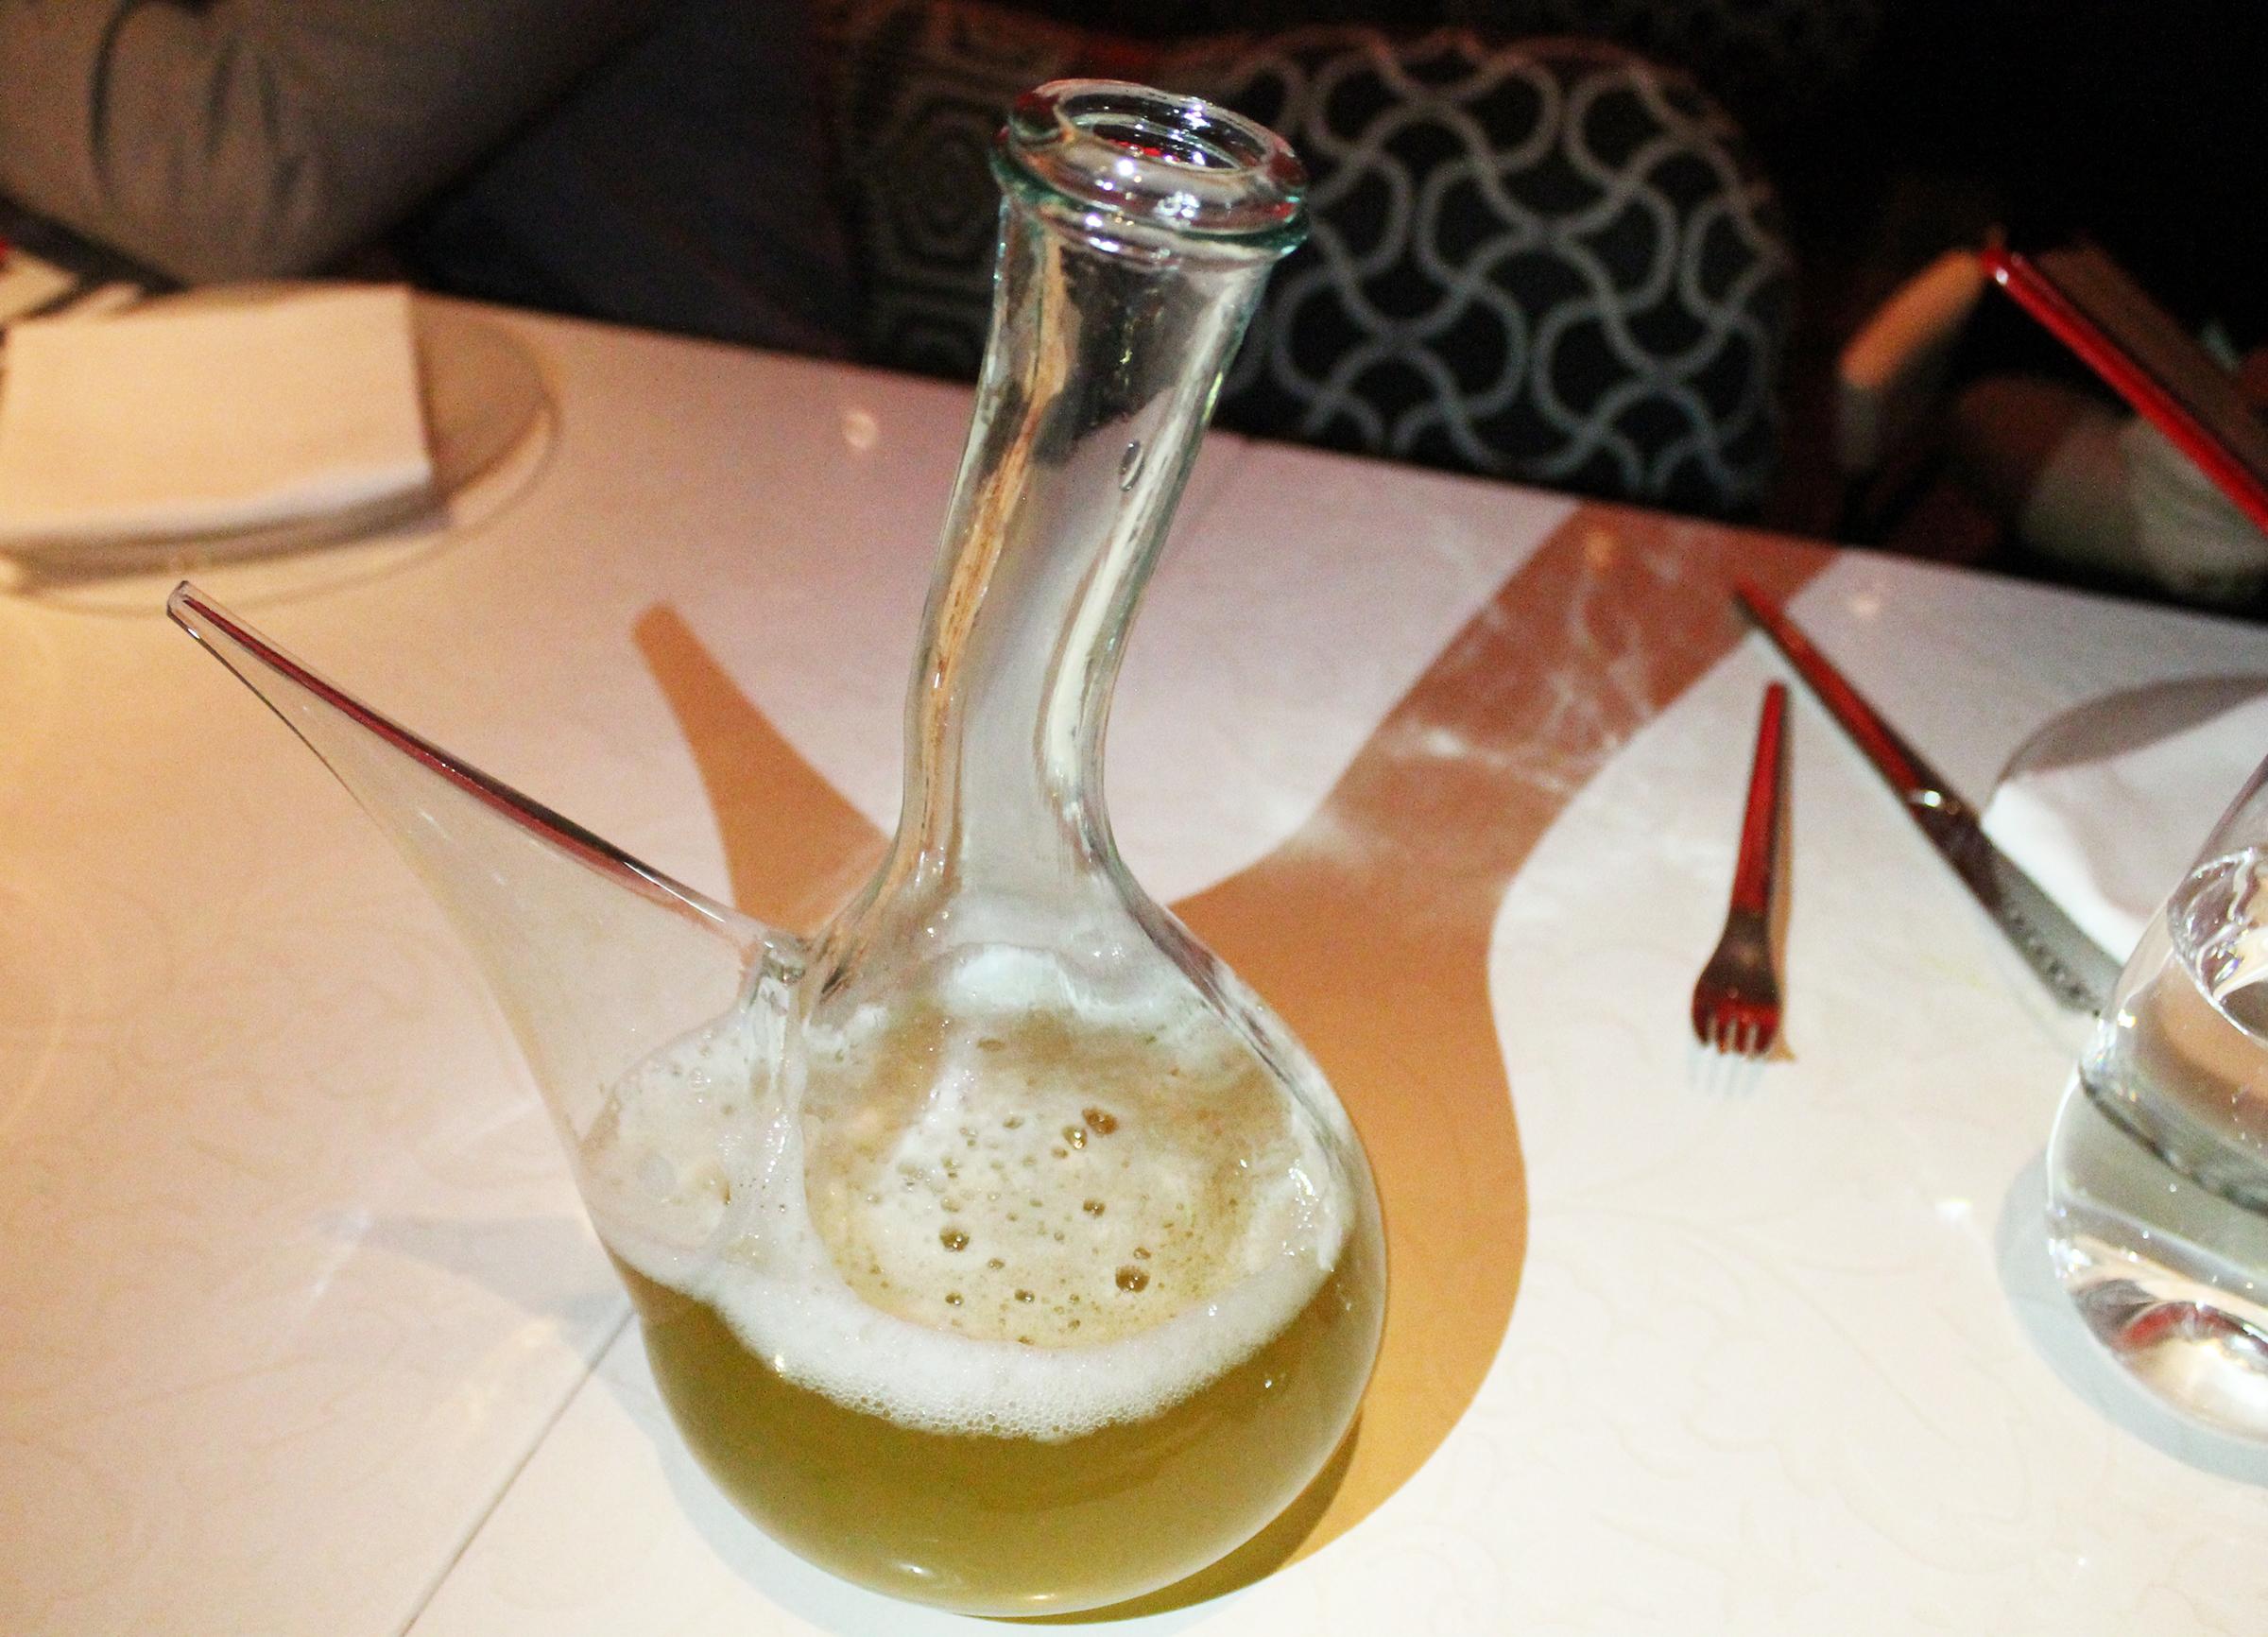 Clara: Beer and house-made rosemary lemonade